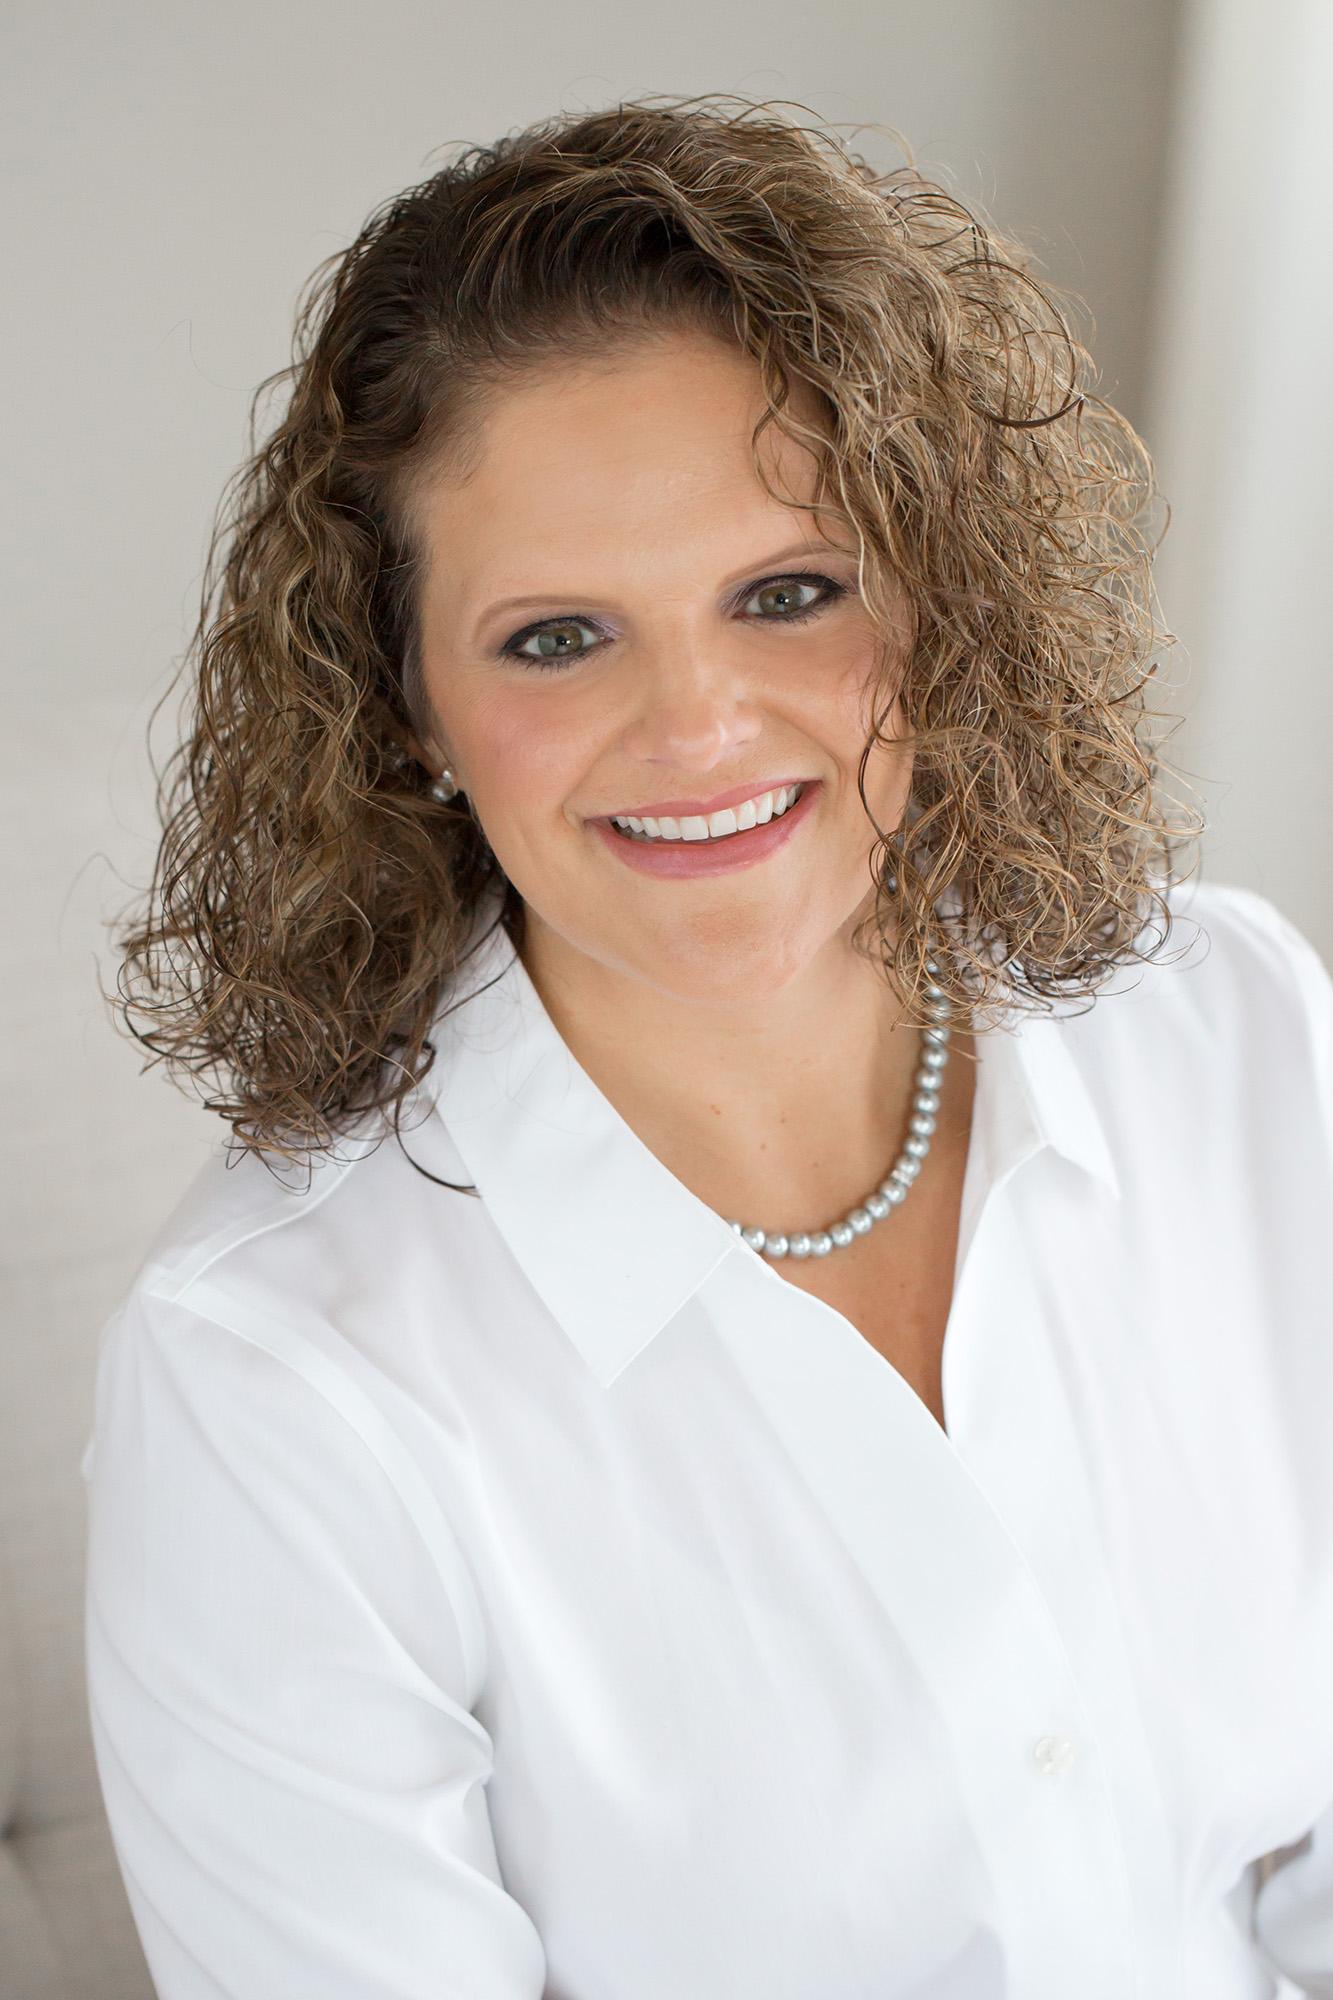 Louisville KY Family Photographer | Julie Brock Photography | Women's Headshot Poses